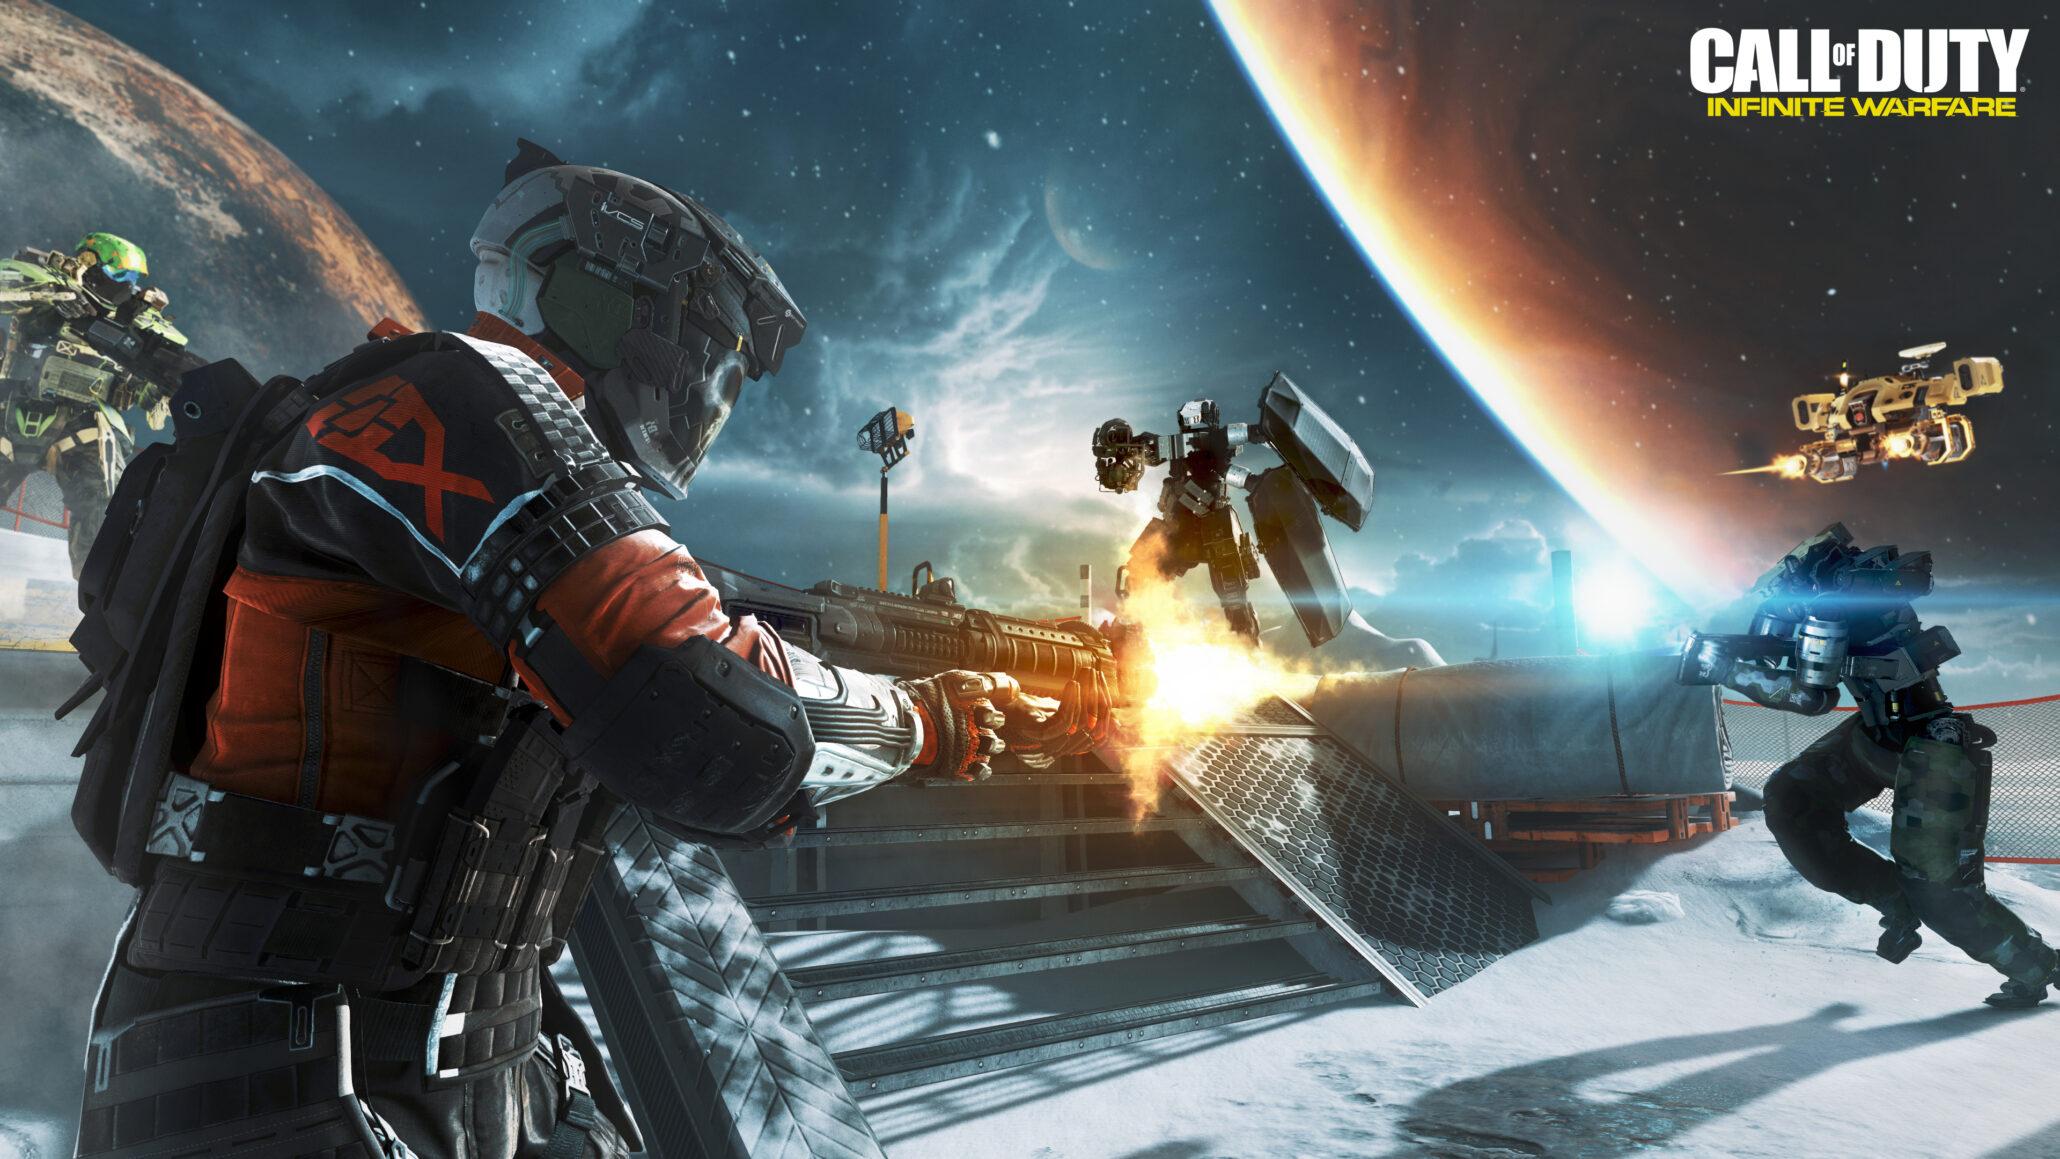 Call of Duty: Infinite Warfare Multiplayer Beta Due in